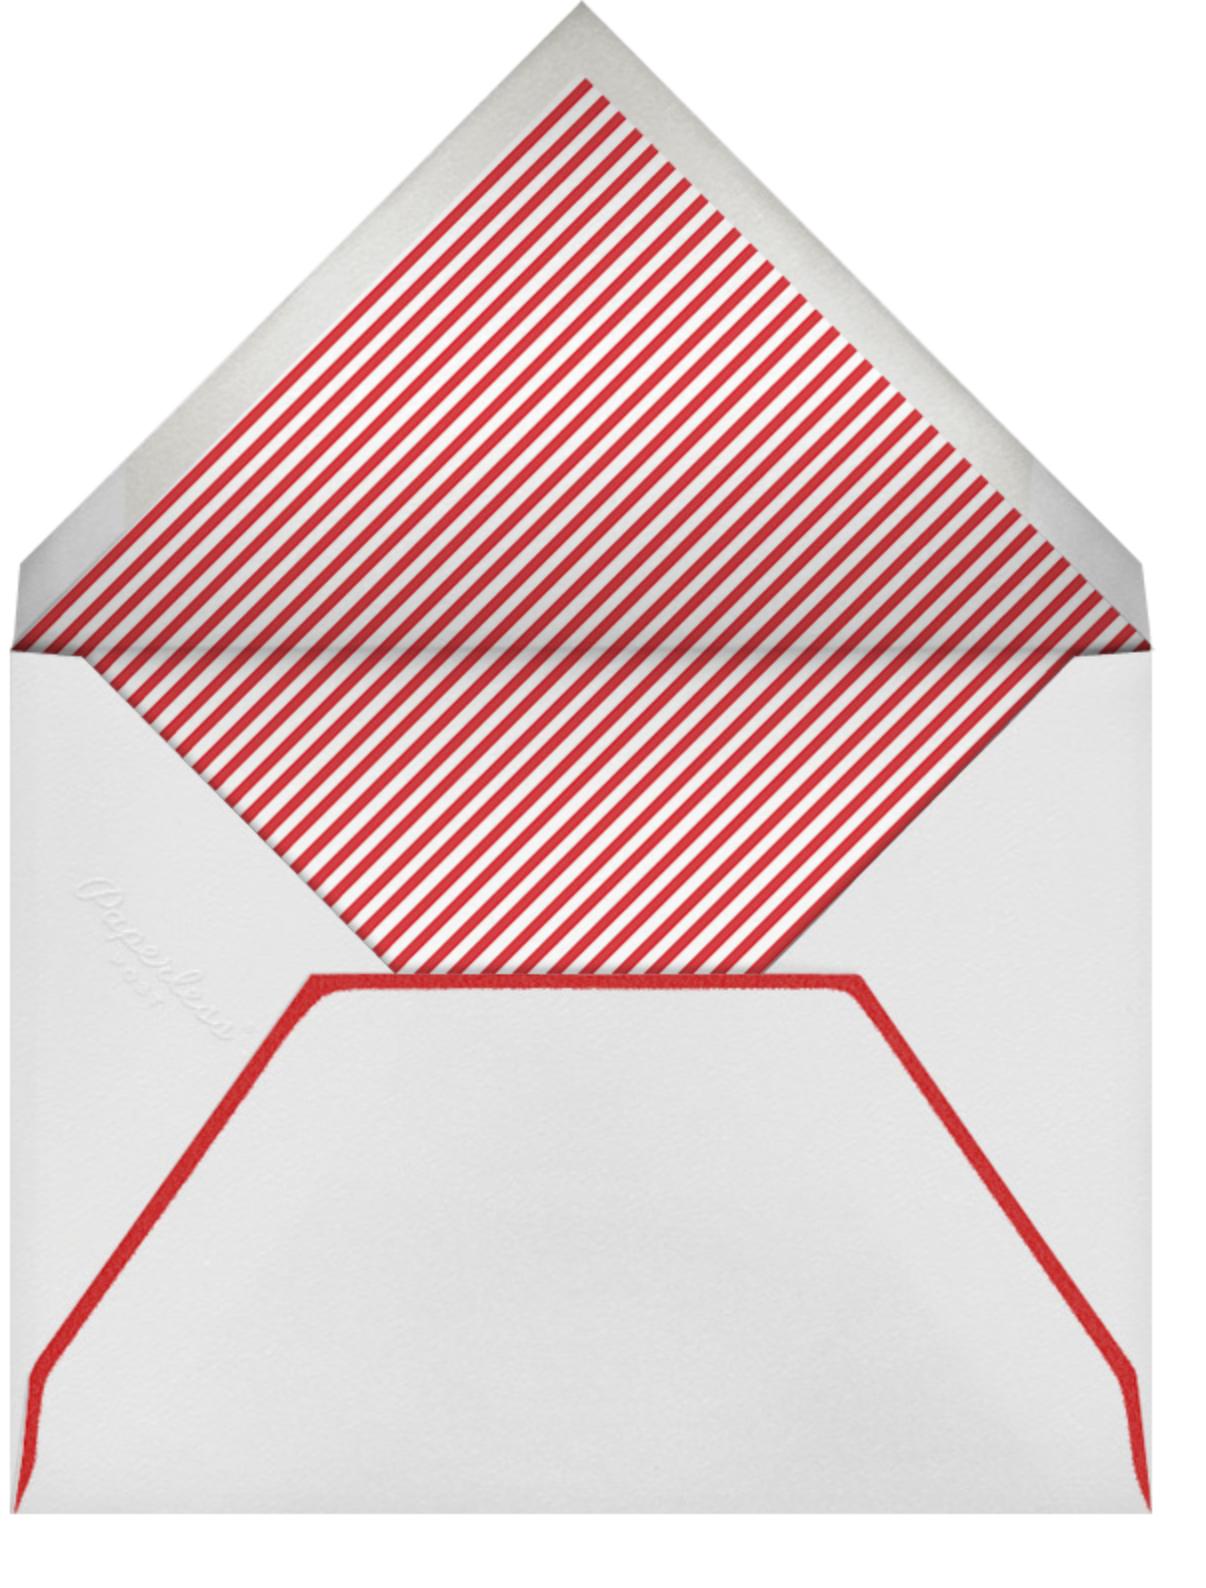 I Couldn't Love You More - Mr. Boddington's Studio - Love and romance - envelope back